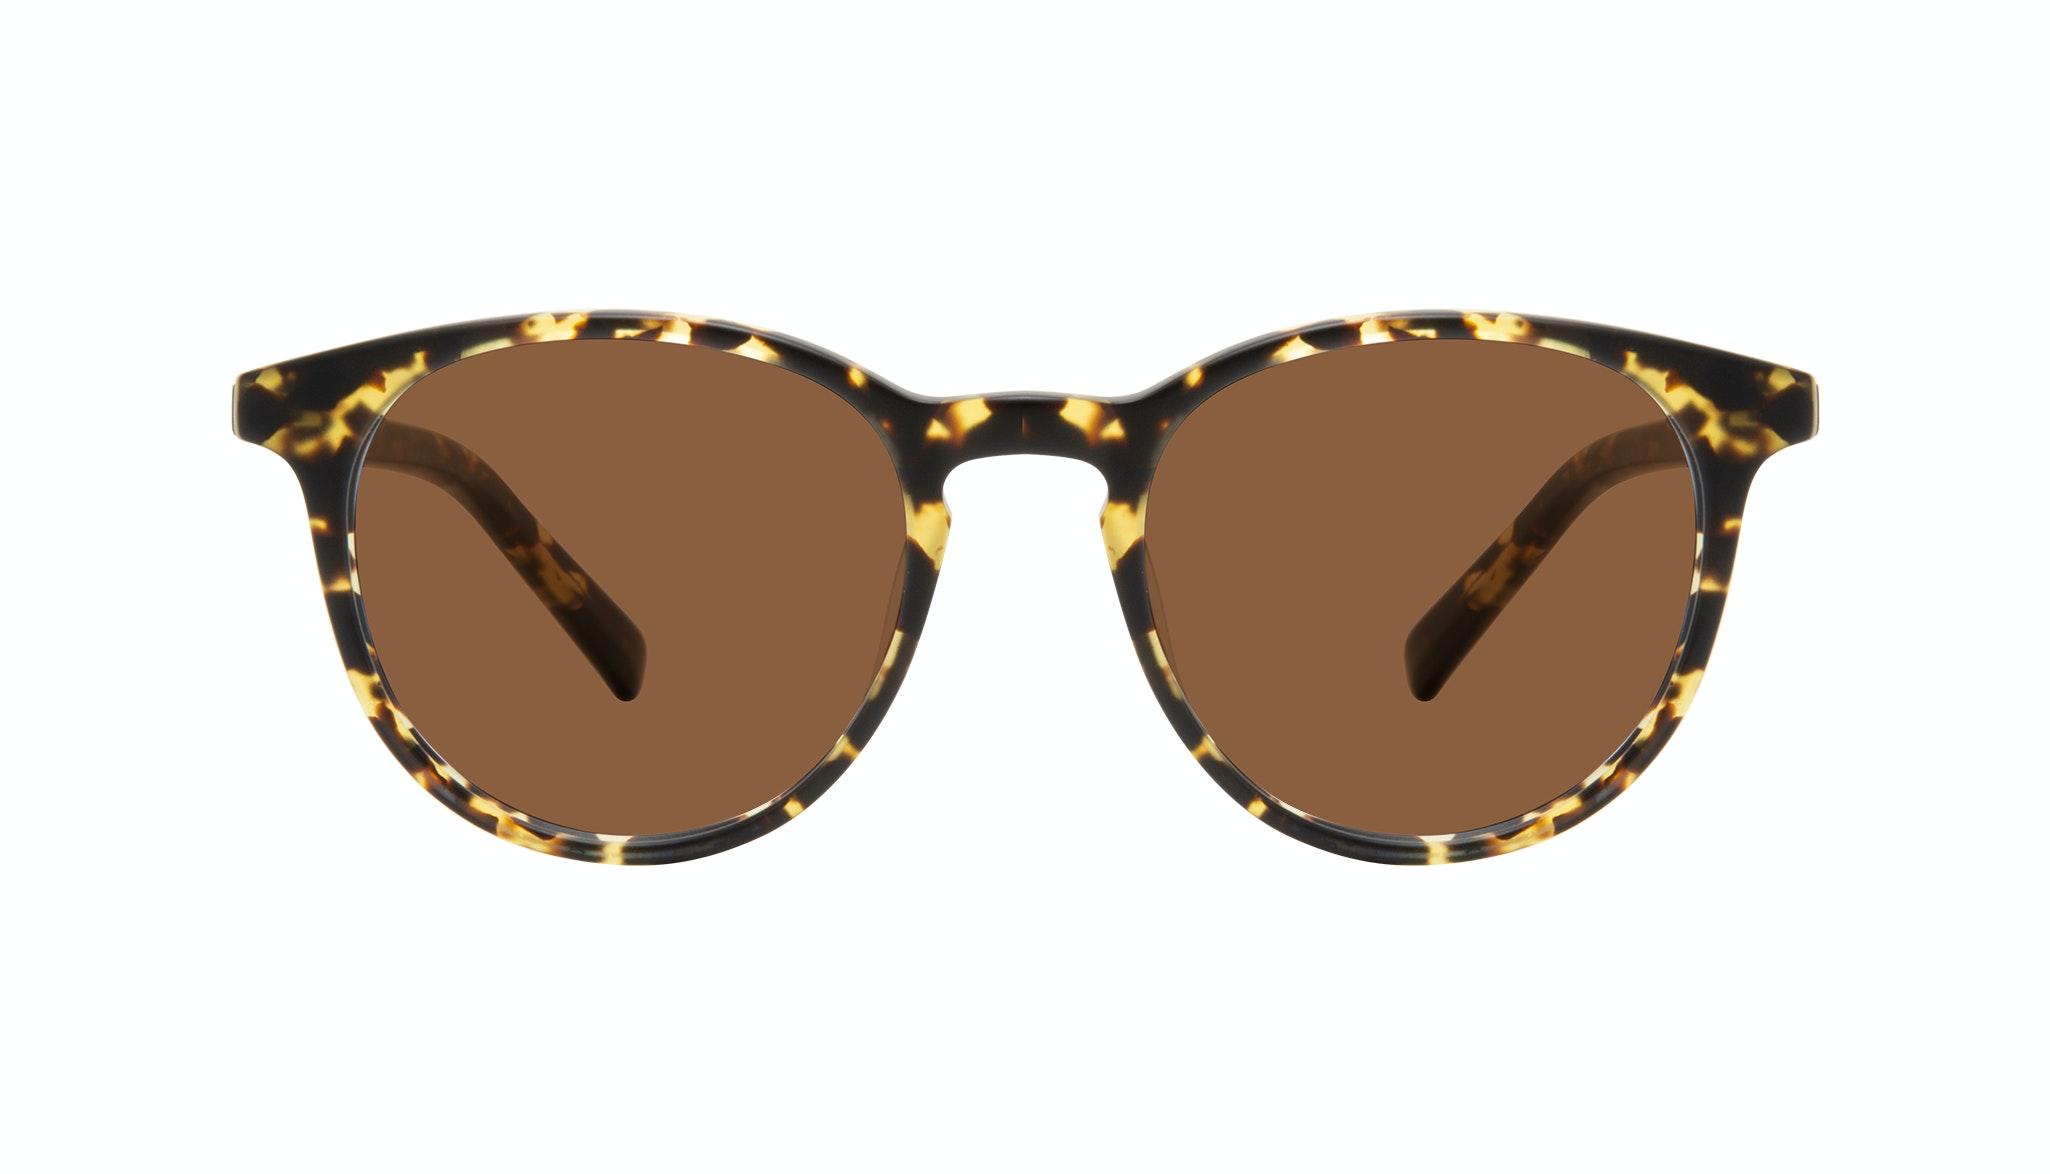 Affordable Fashion Glasses Round Sunglasses Men Select Tortoise Matte Front